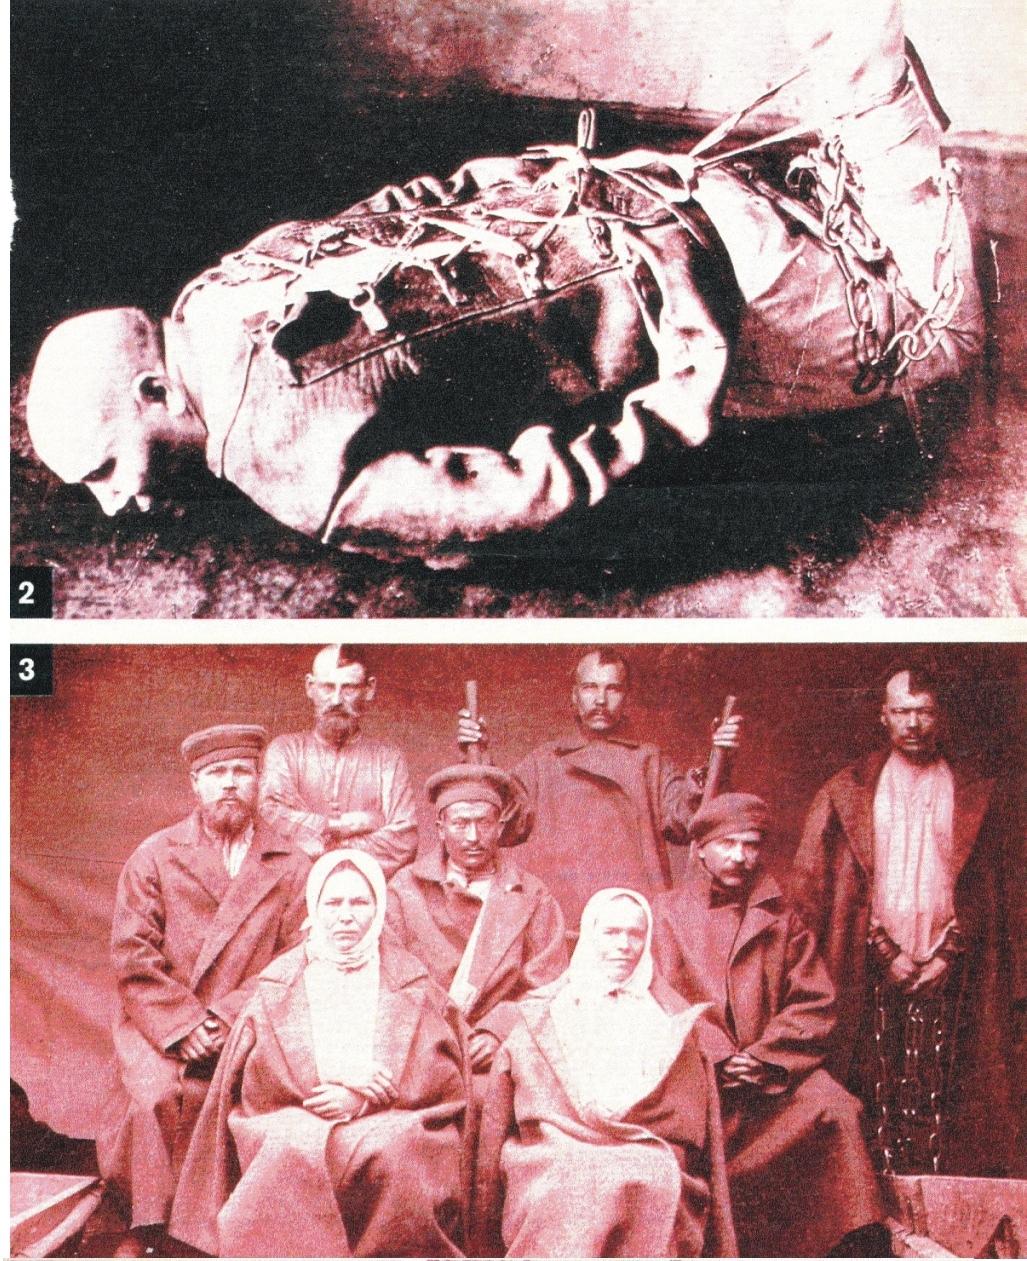 Genocidios y holocausto comunista - TARINGA 3300726861_2c13f90258_o